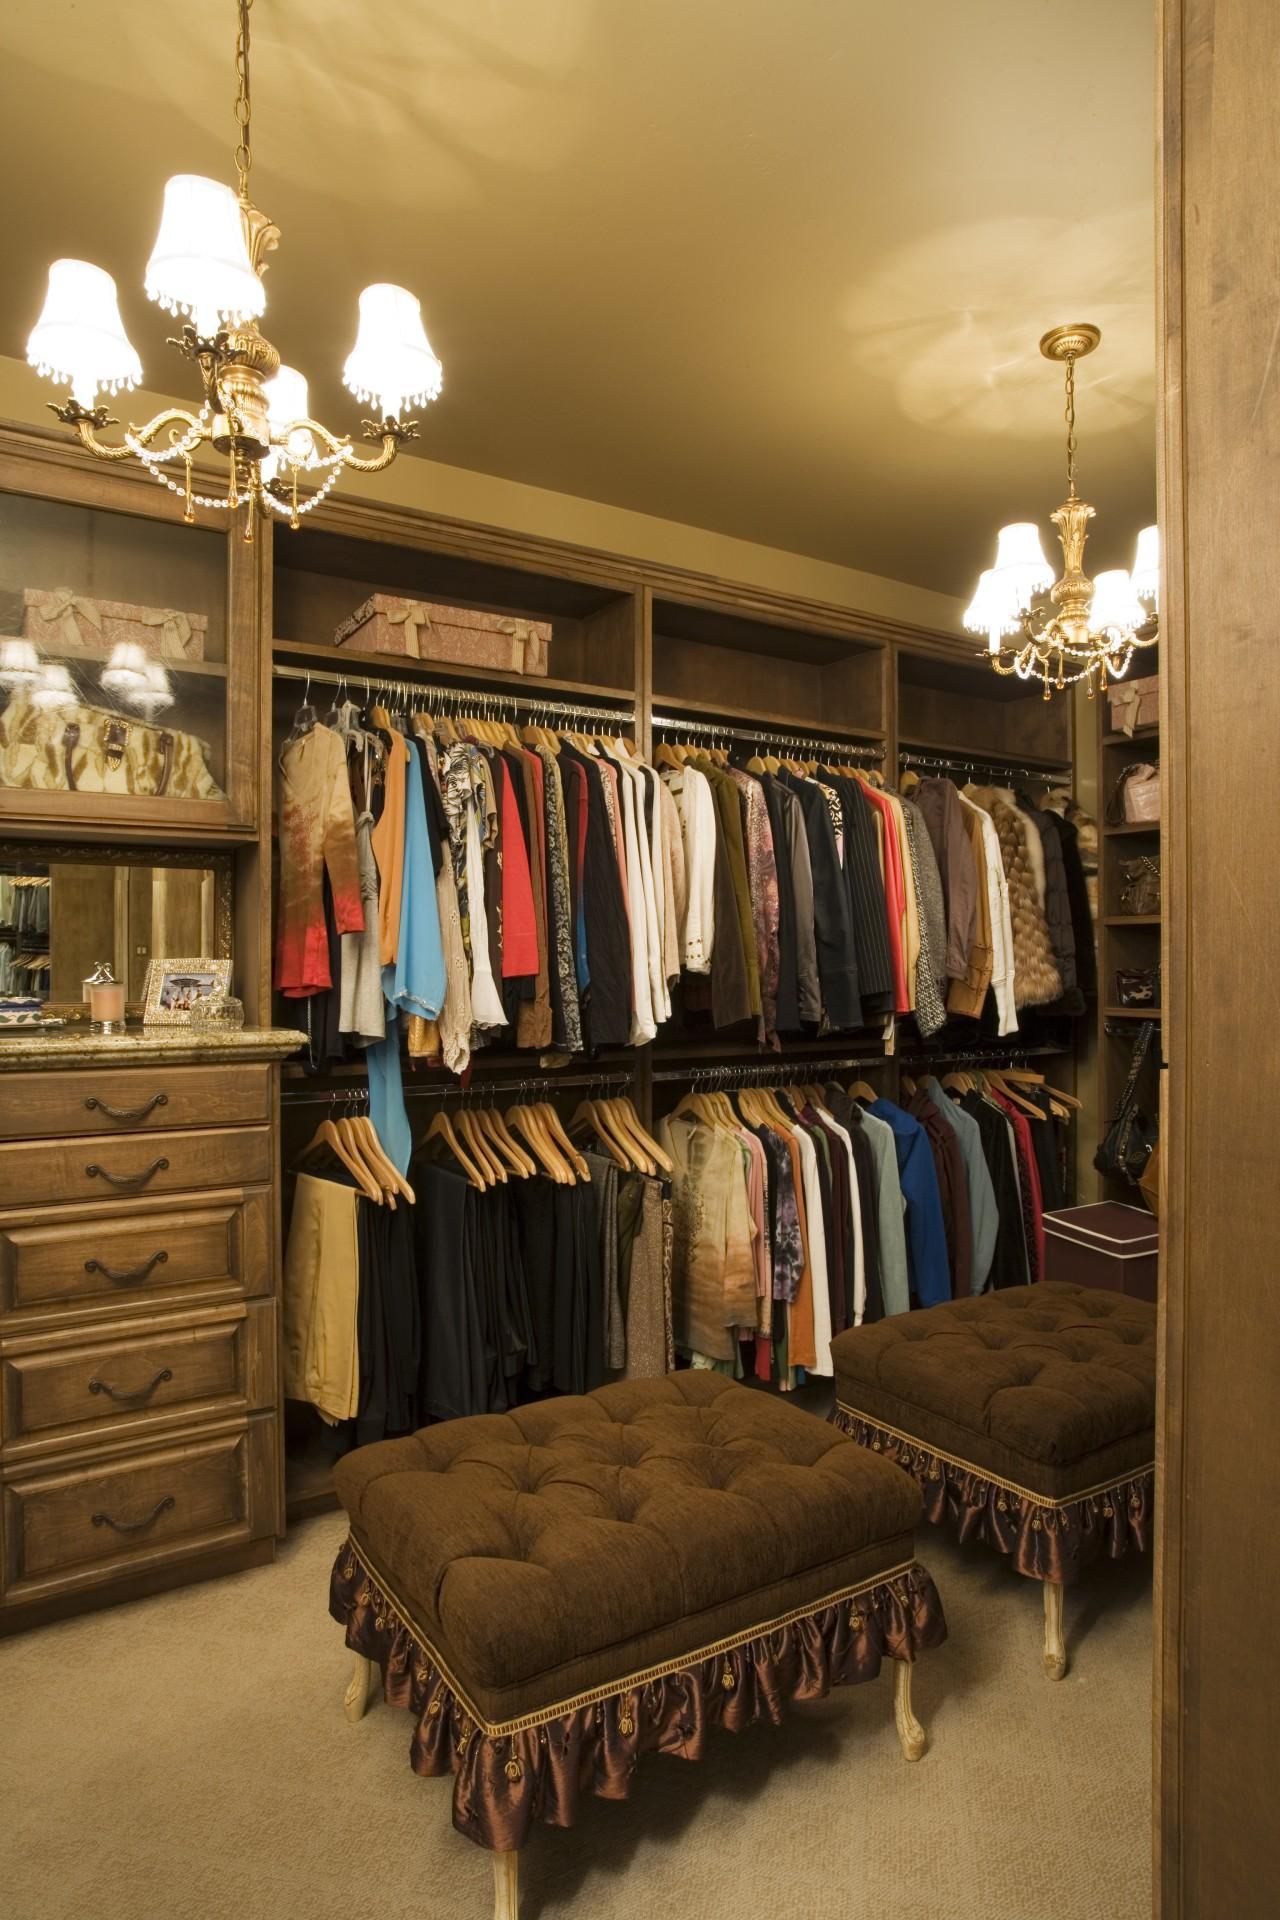 A view of the walk in wardrom accessed boutique, closet, furniture, interior design, room, brown, orange